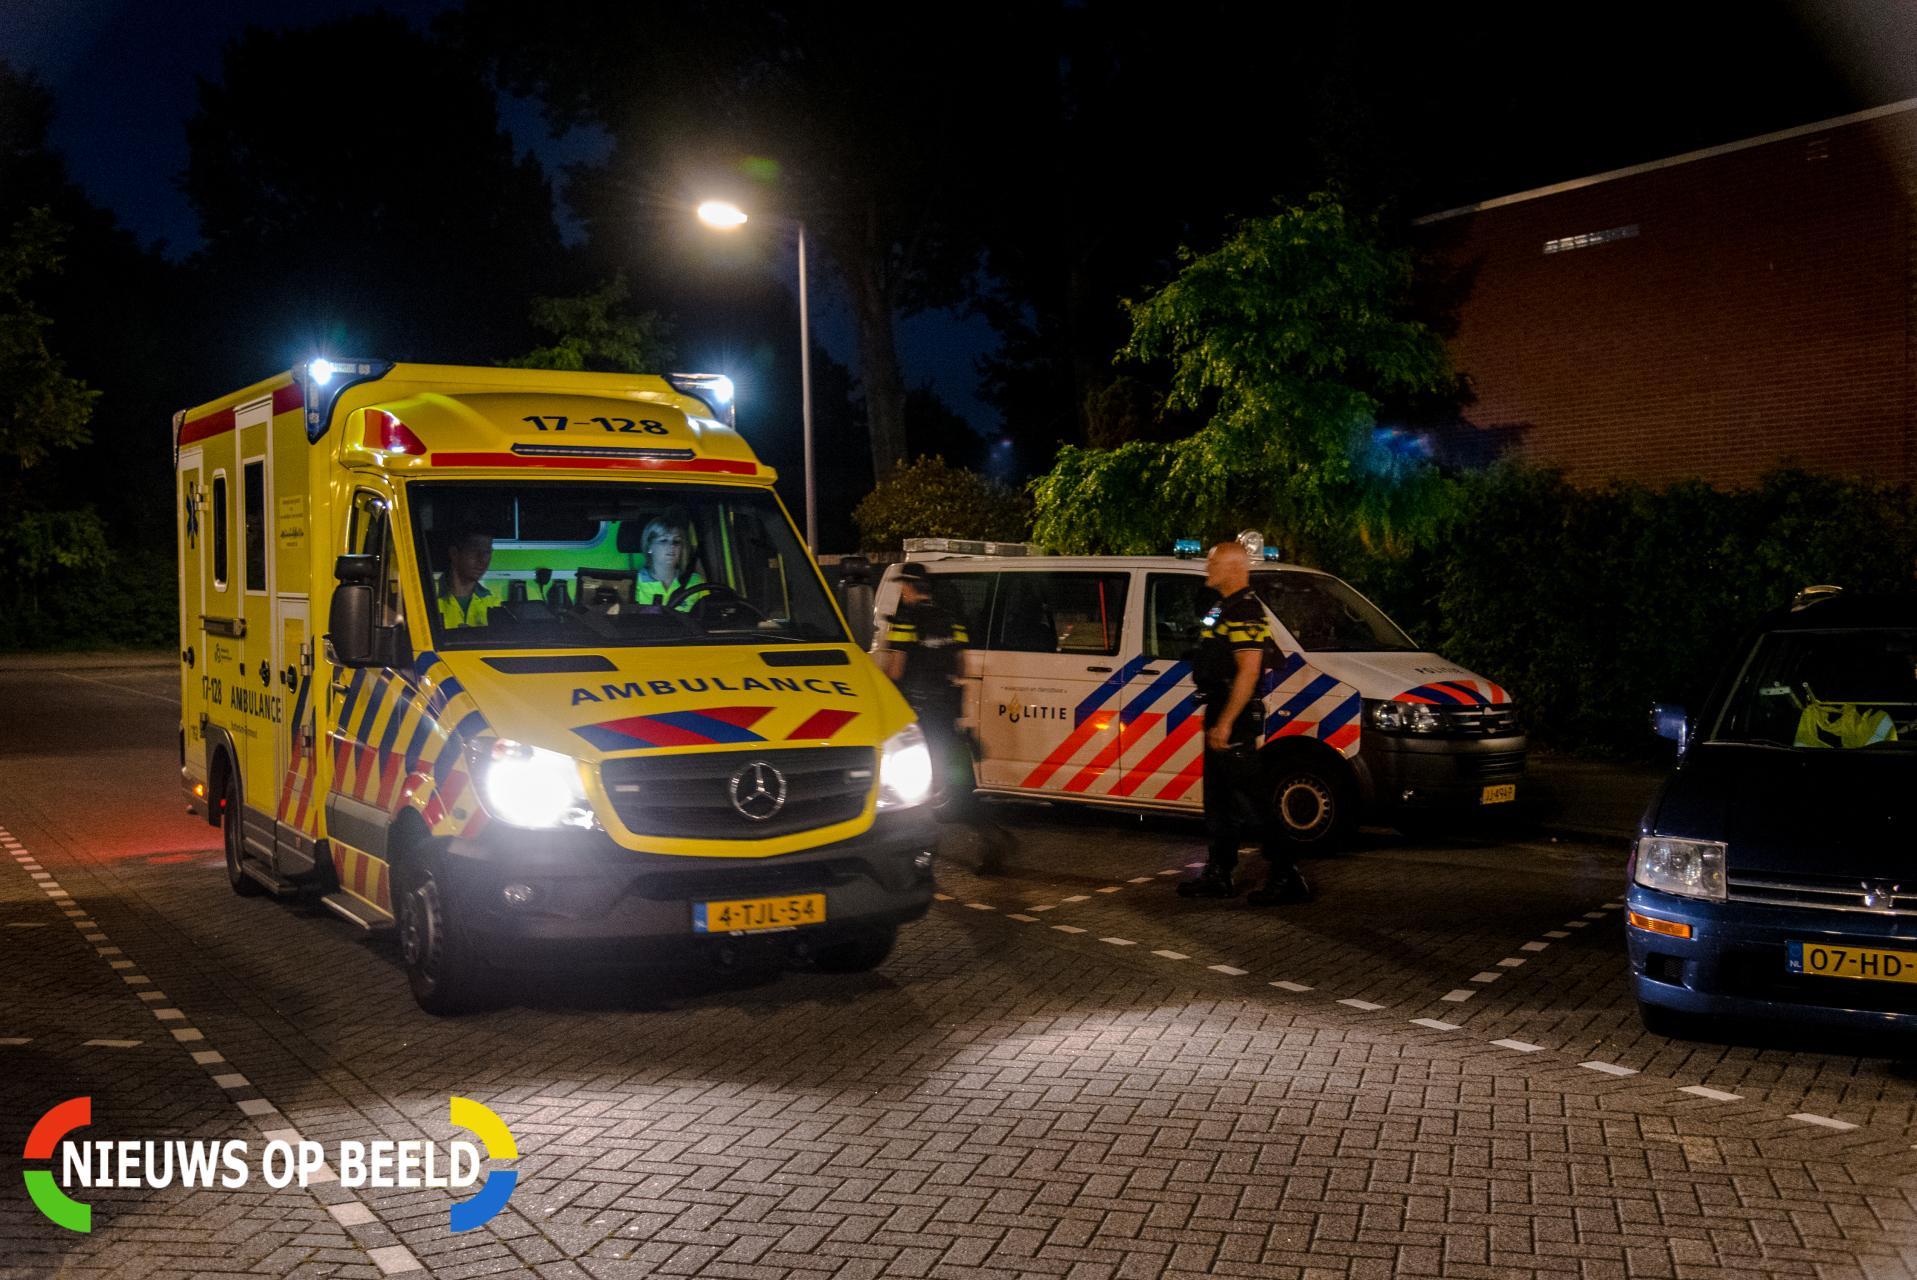 Persoon gewond na vechtpartij in woning Karperstraat Hoogvliet